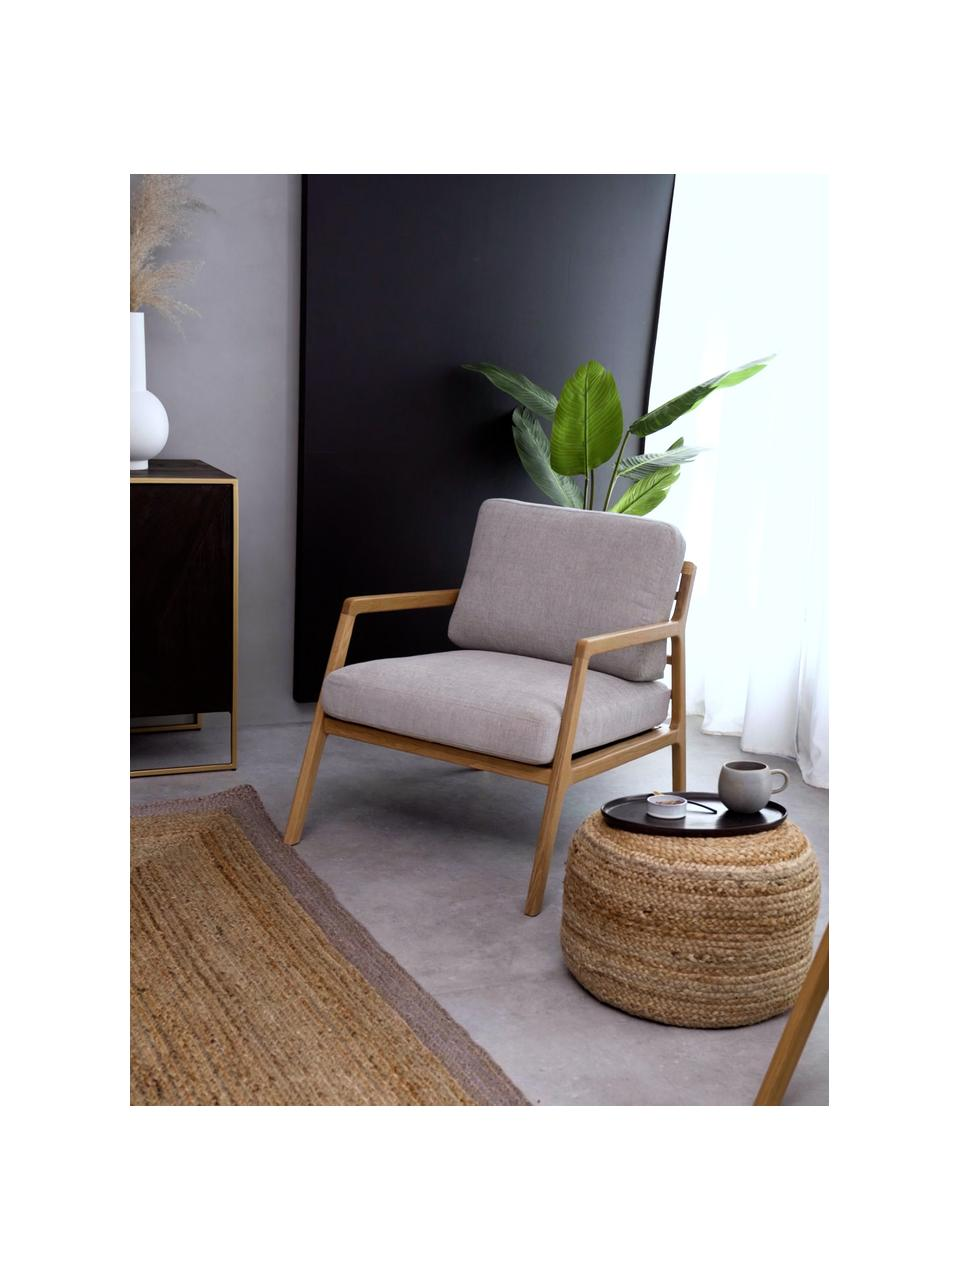 Sessel Becky aus Eichenholz, Bezug: Polyester Der hochwertige, Gestell: Massives Eichenholz, Webstoff Grau, Eichenholz, B 73 x T 90 cm